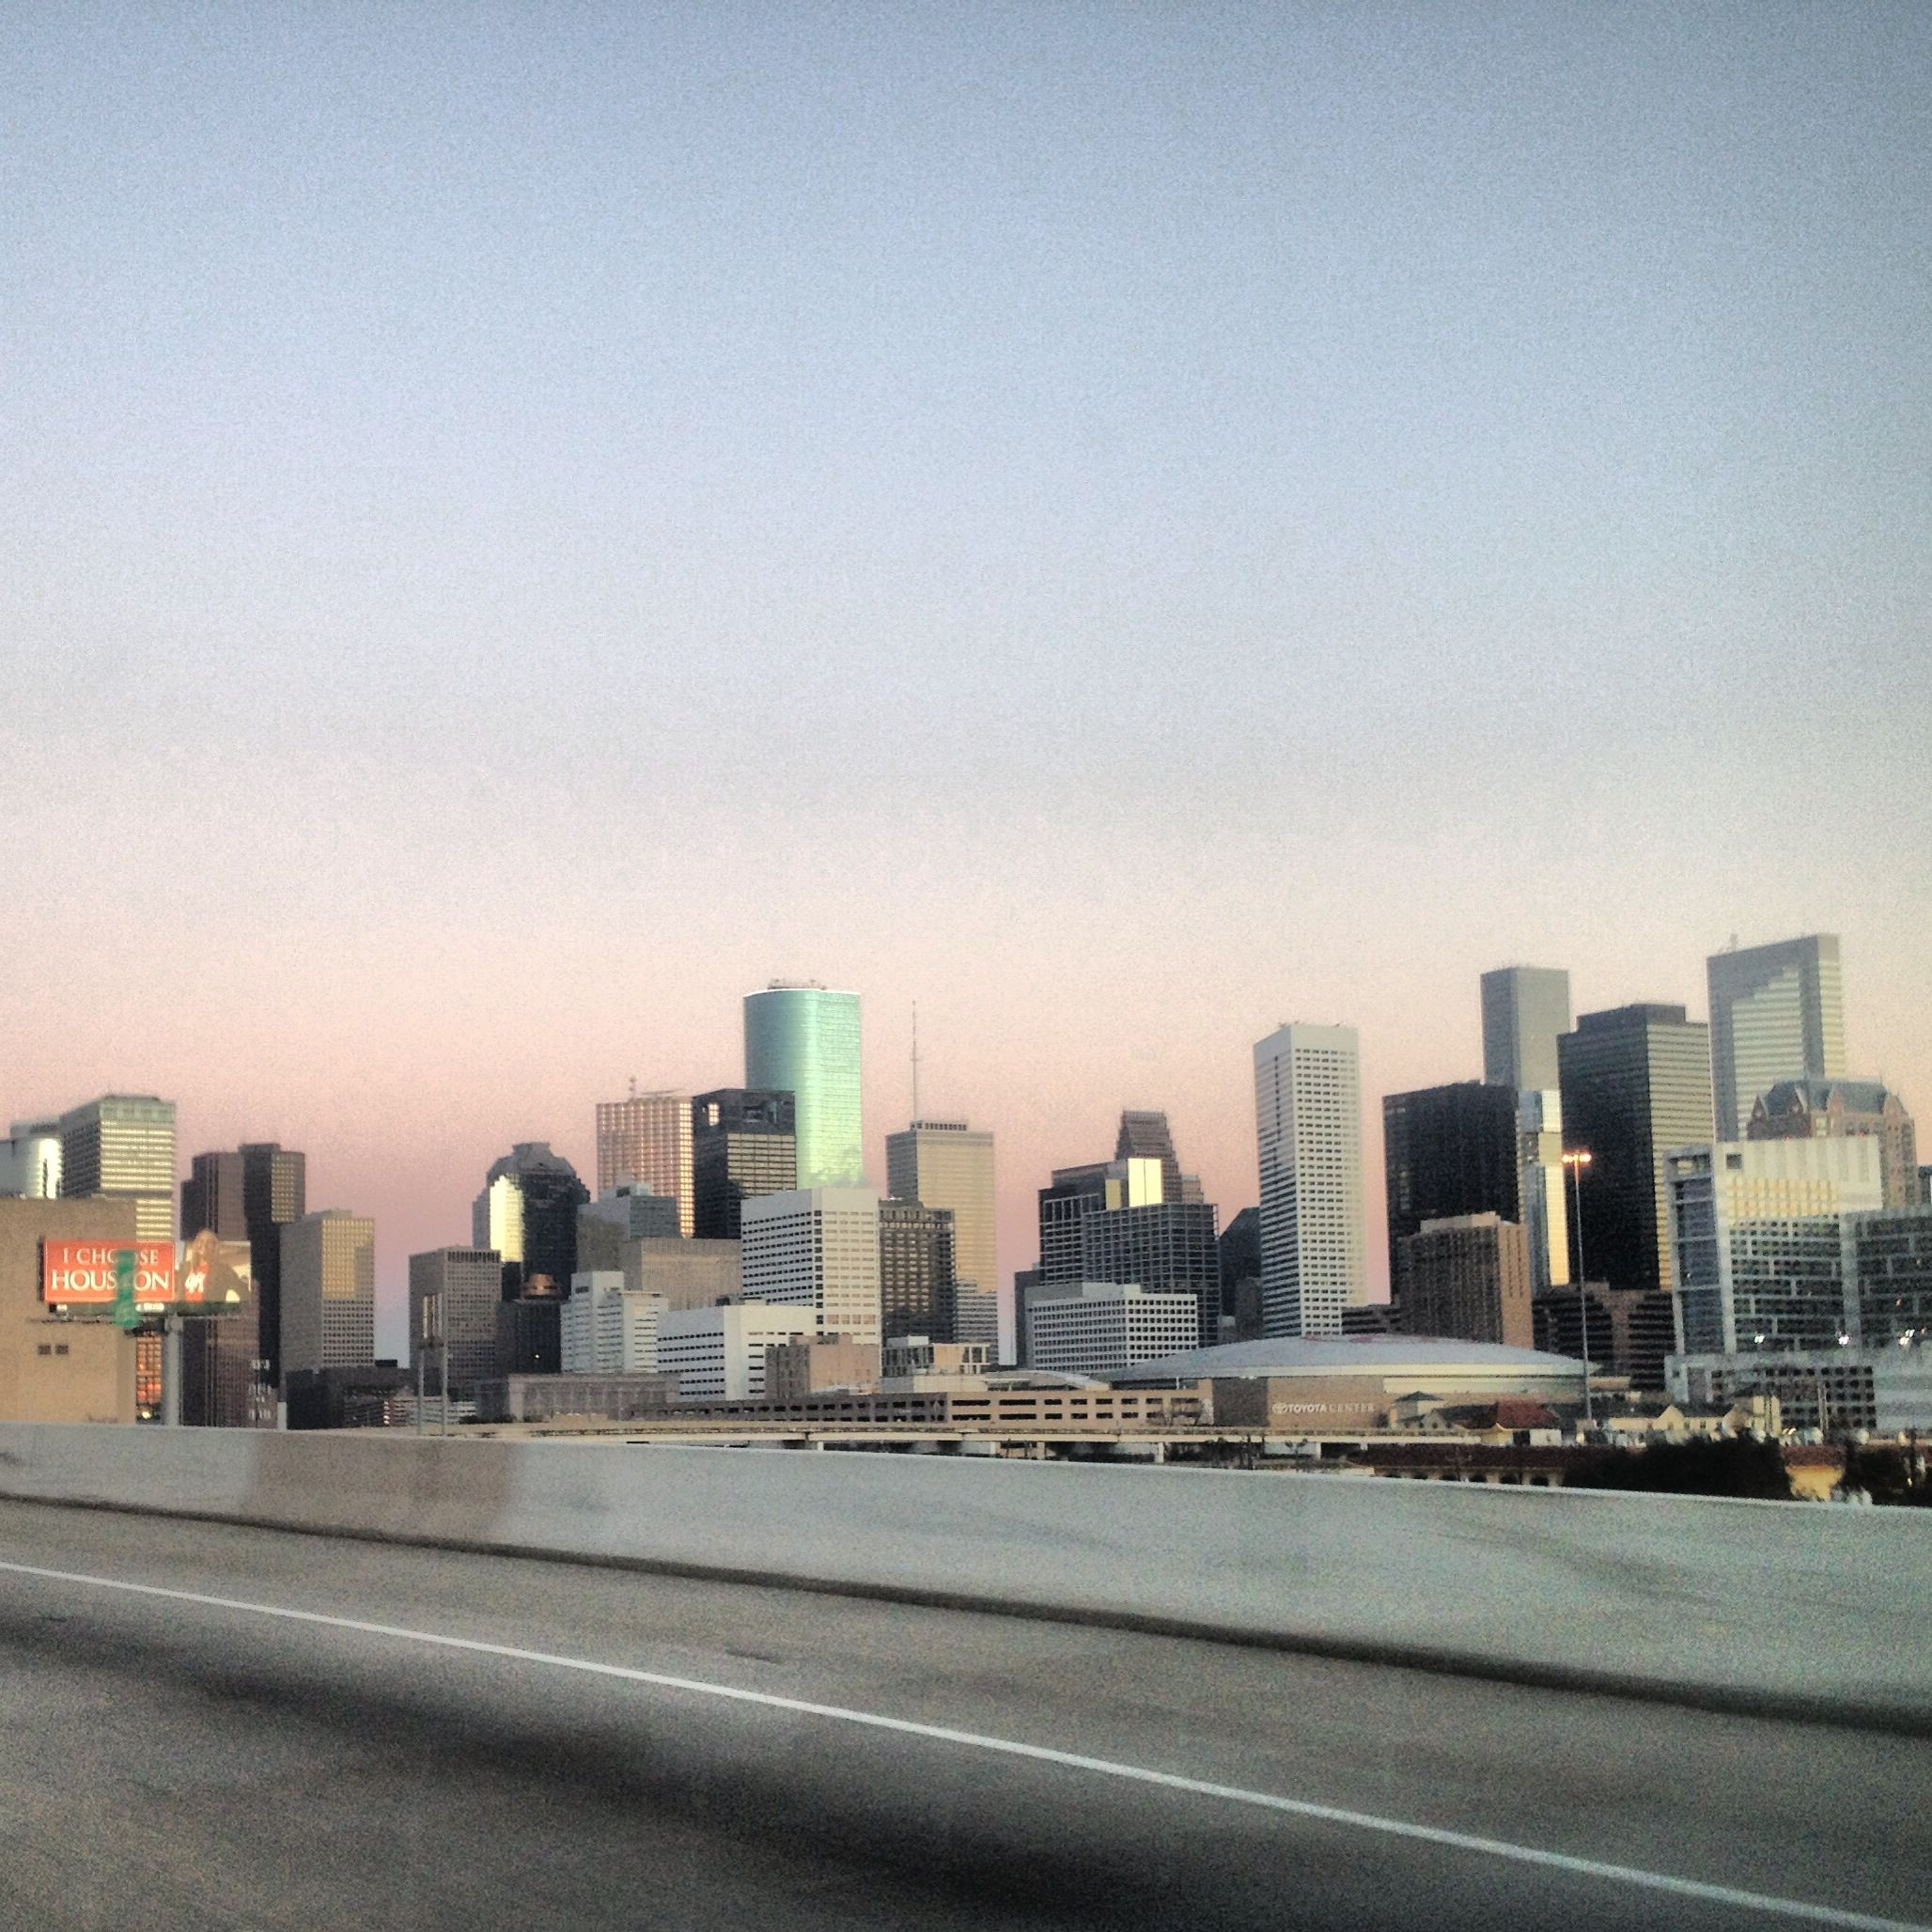 Houston Tx Www Usurpclothingco Com Texas Born And Raised New York Skyline Skyline Travel